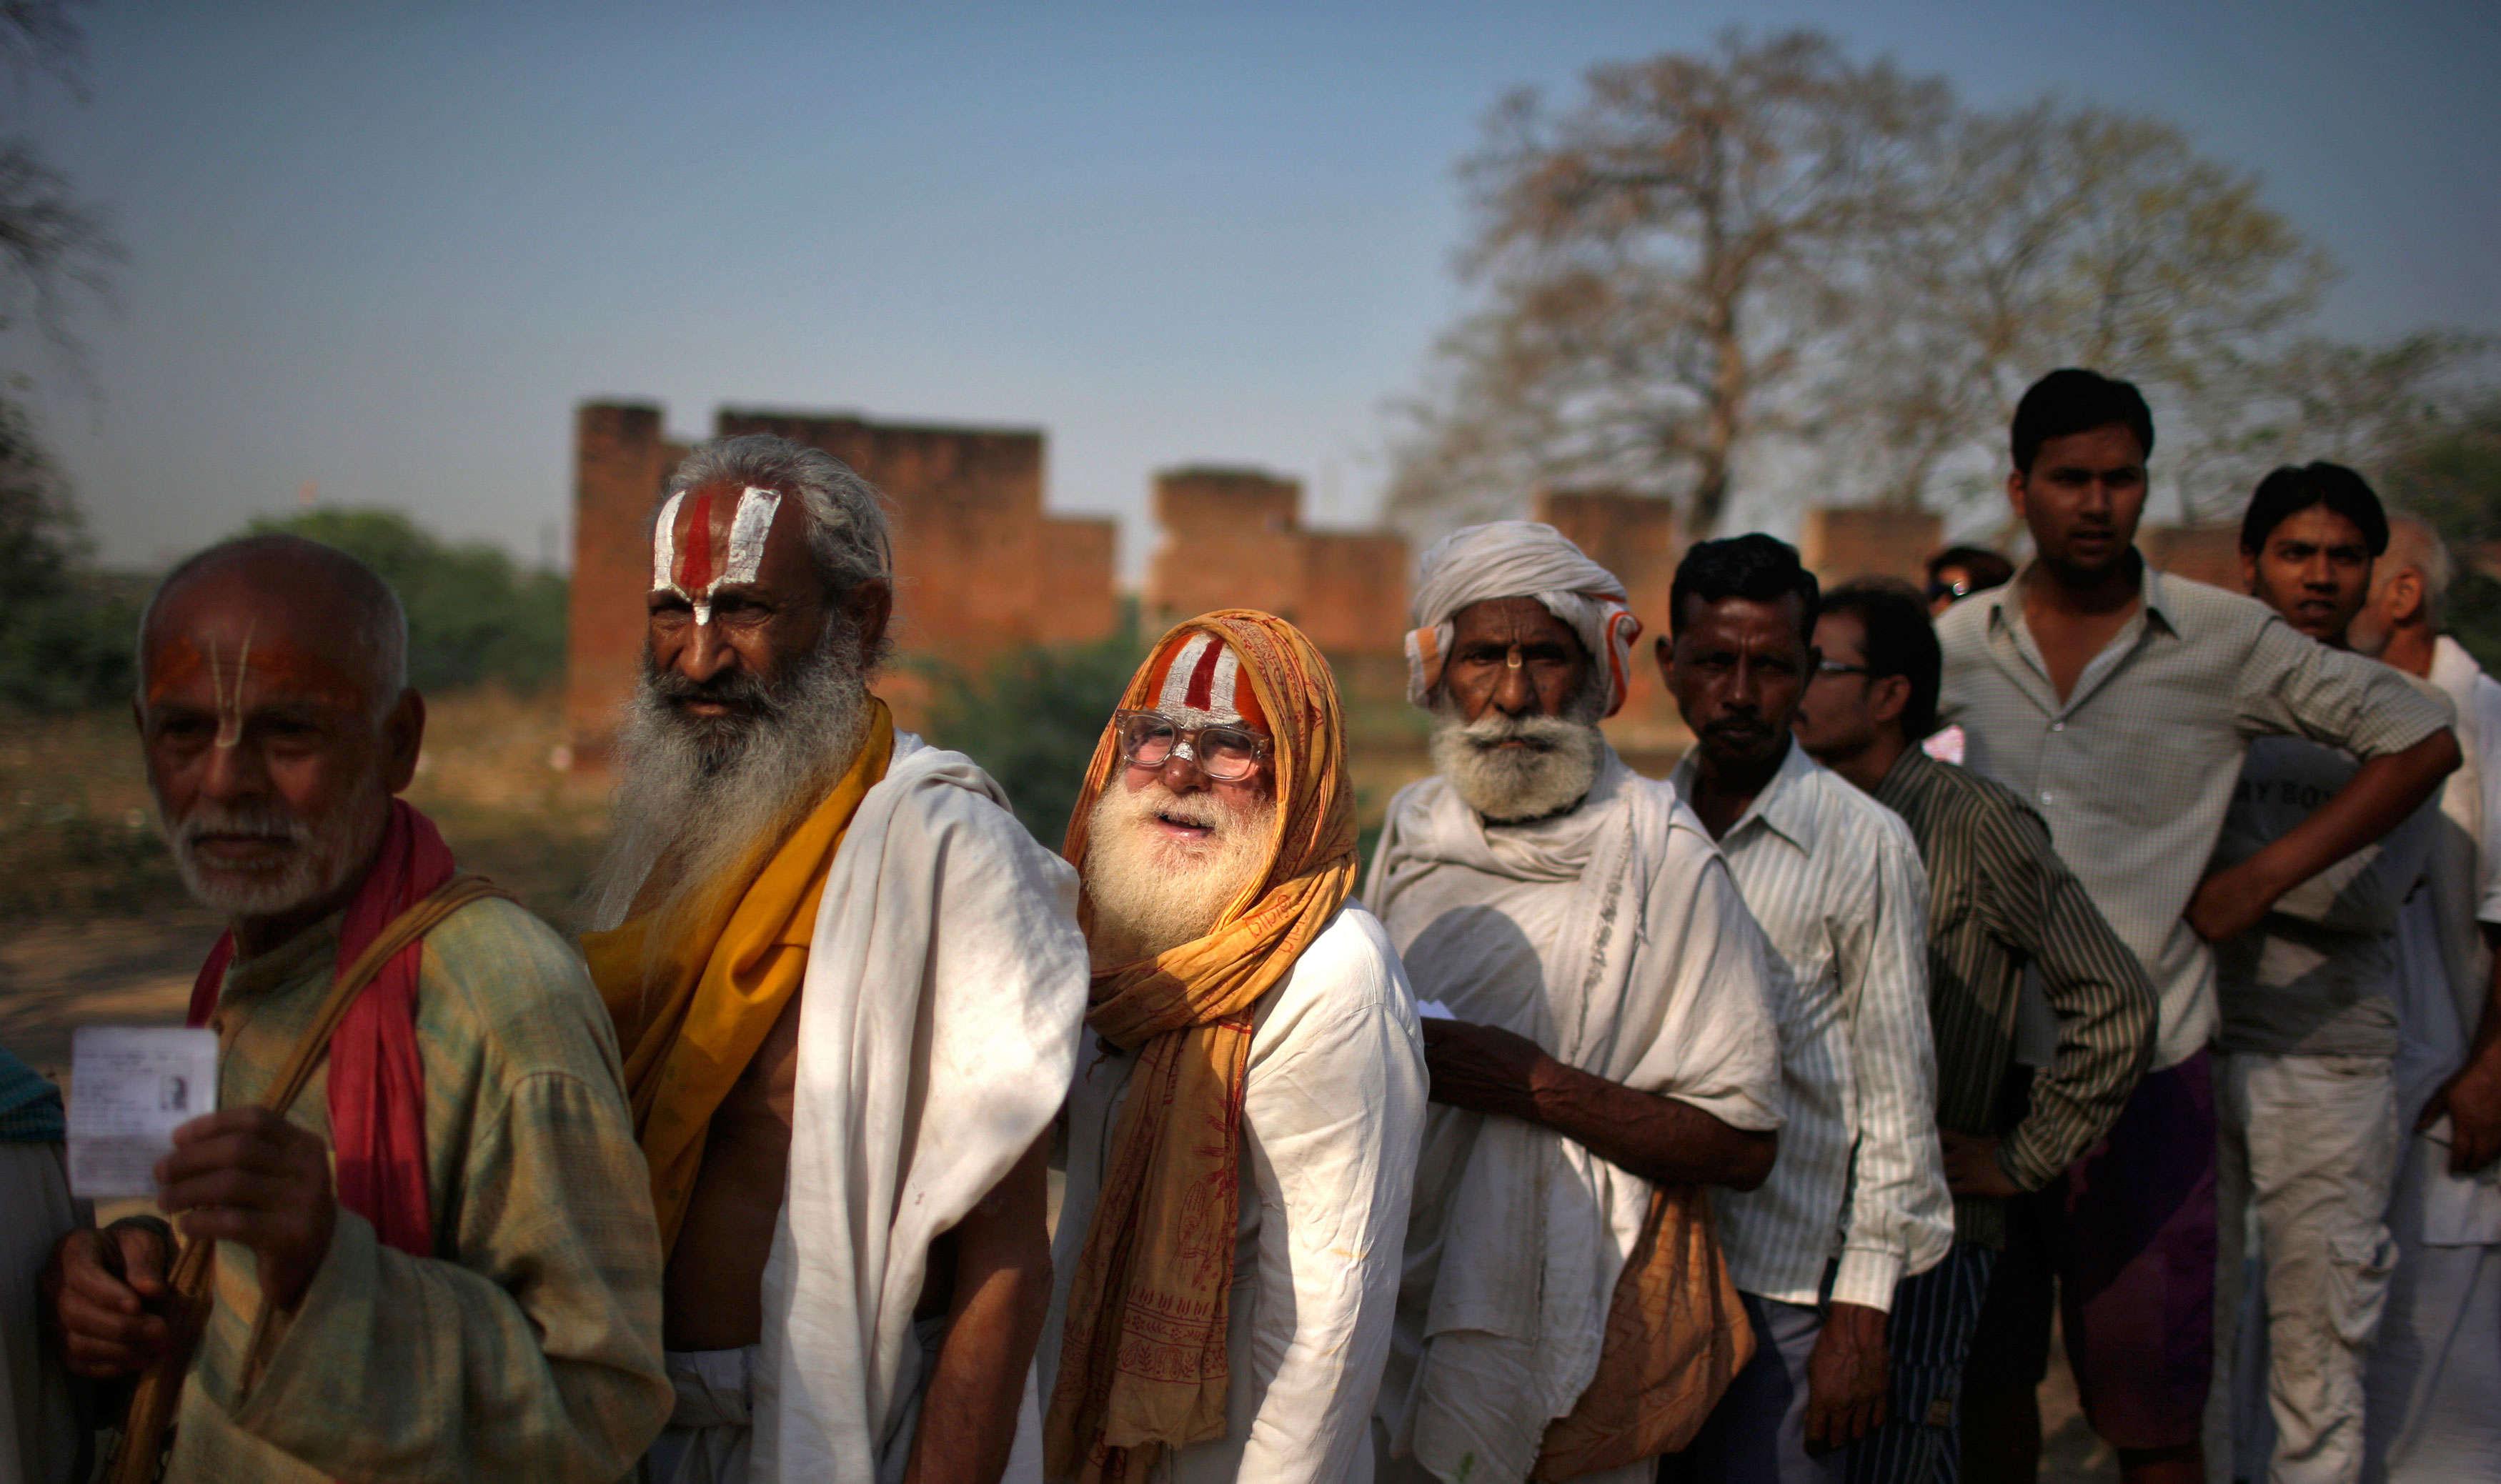 Lok Sabha Election 2019 1st Phase - 142 million voters go to